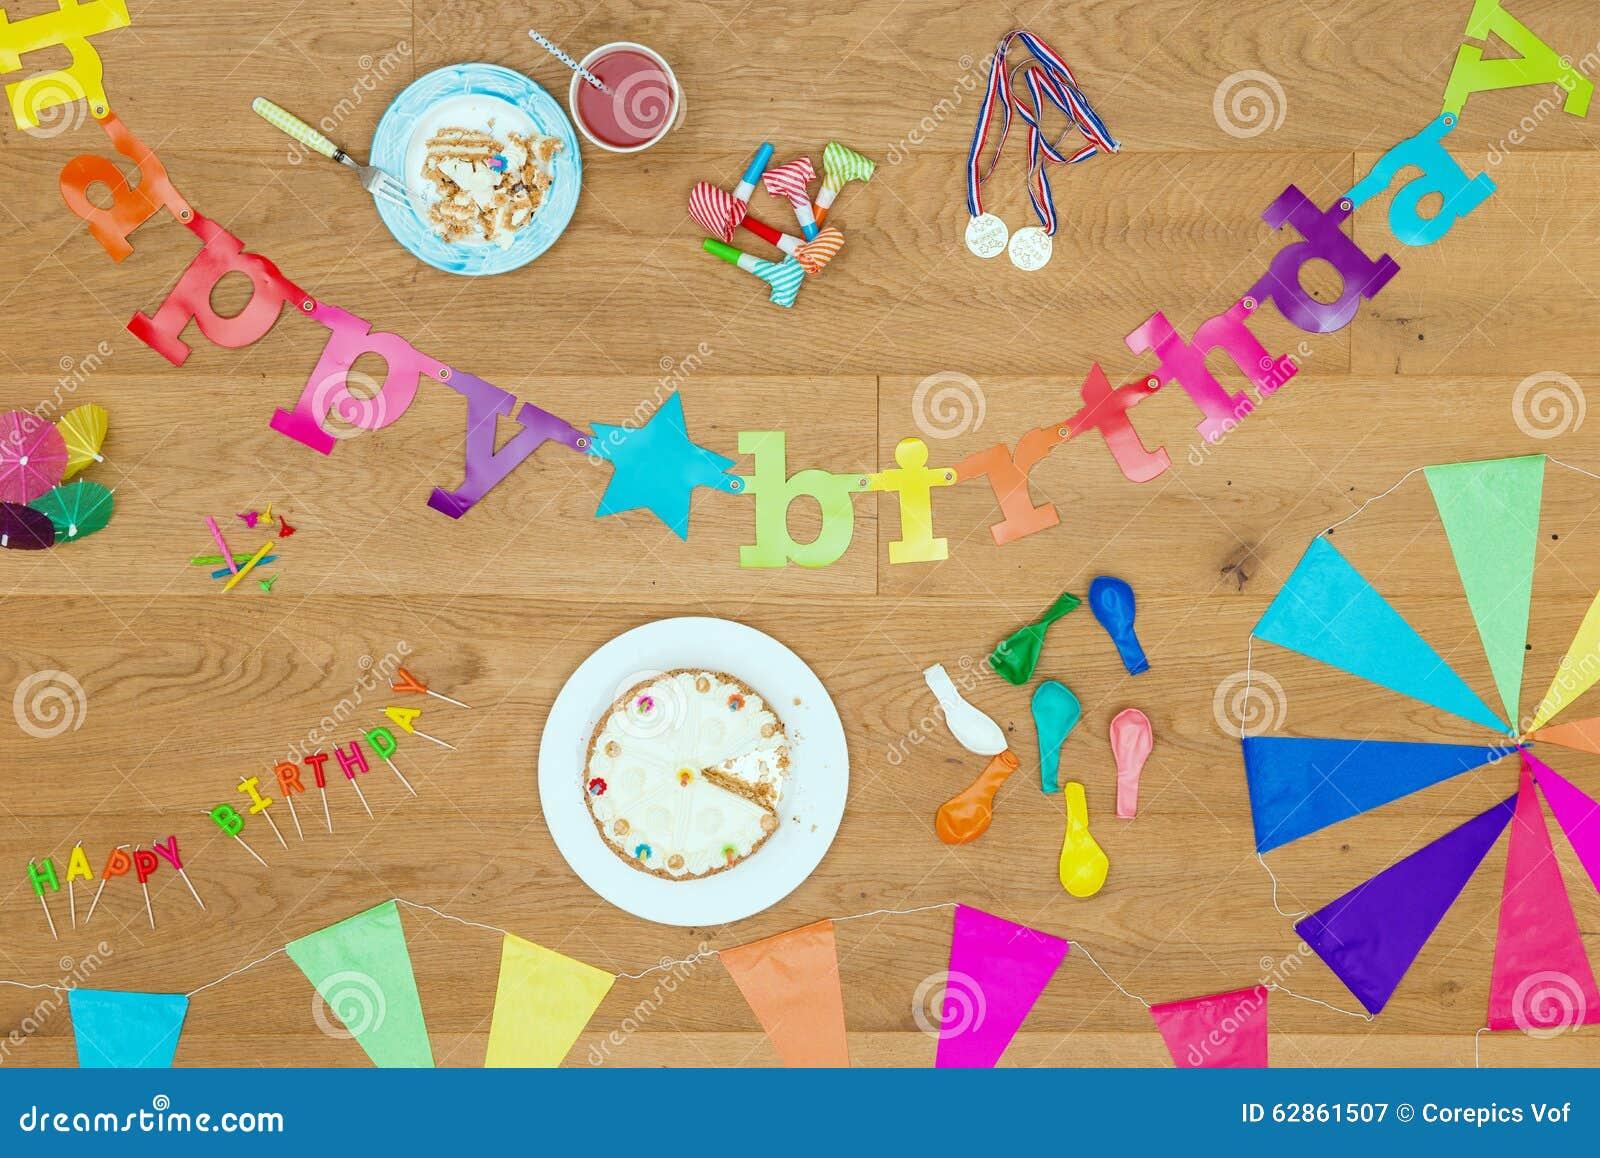 Happy Birthday Party Background Theme